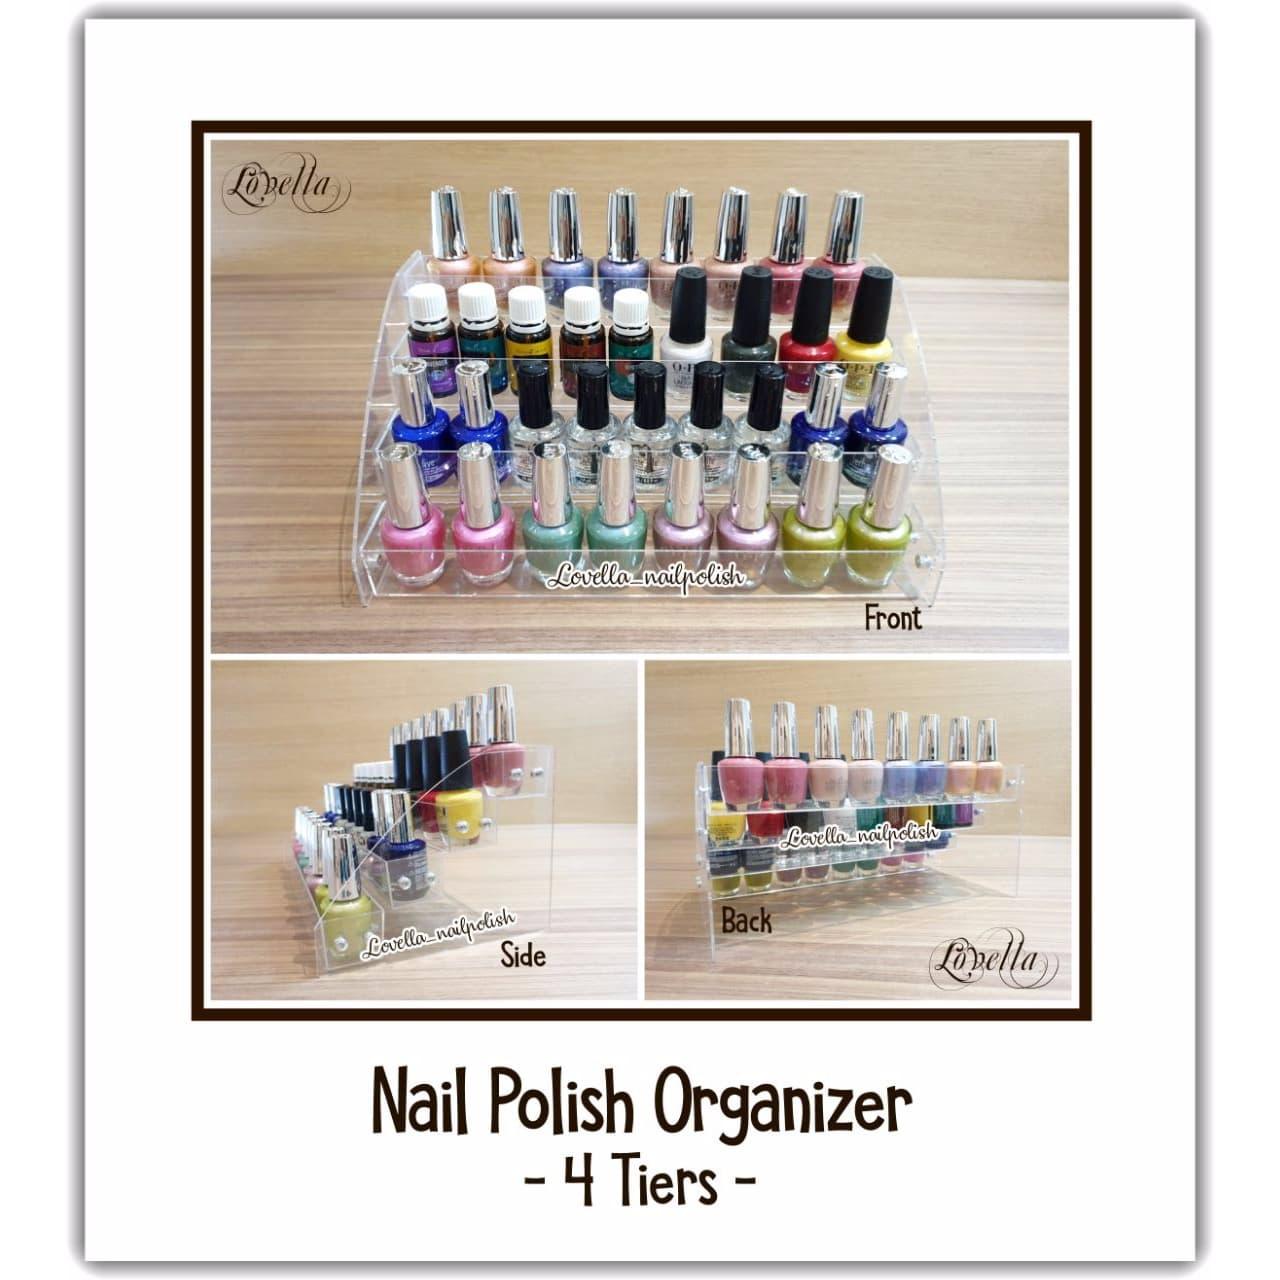 Nail Polish Organizer Nail Polish Rack Rak Nail Polish Rak Kutek - 3 Tiers thumbnail